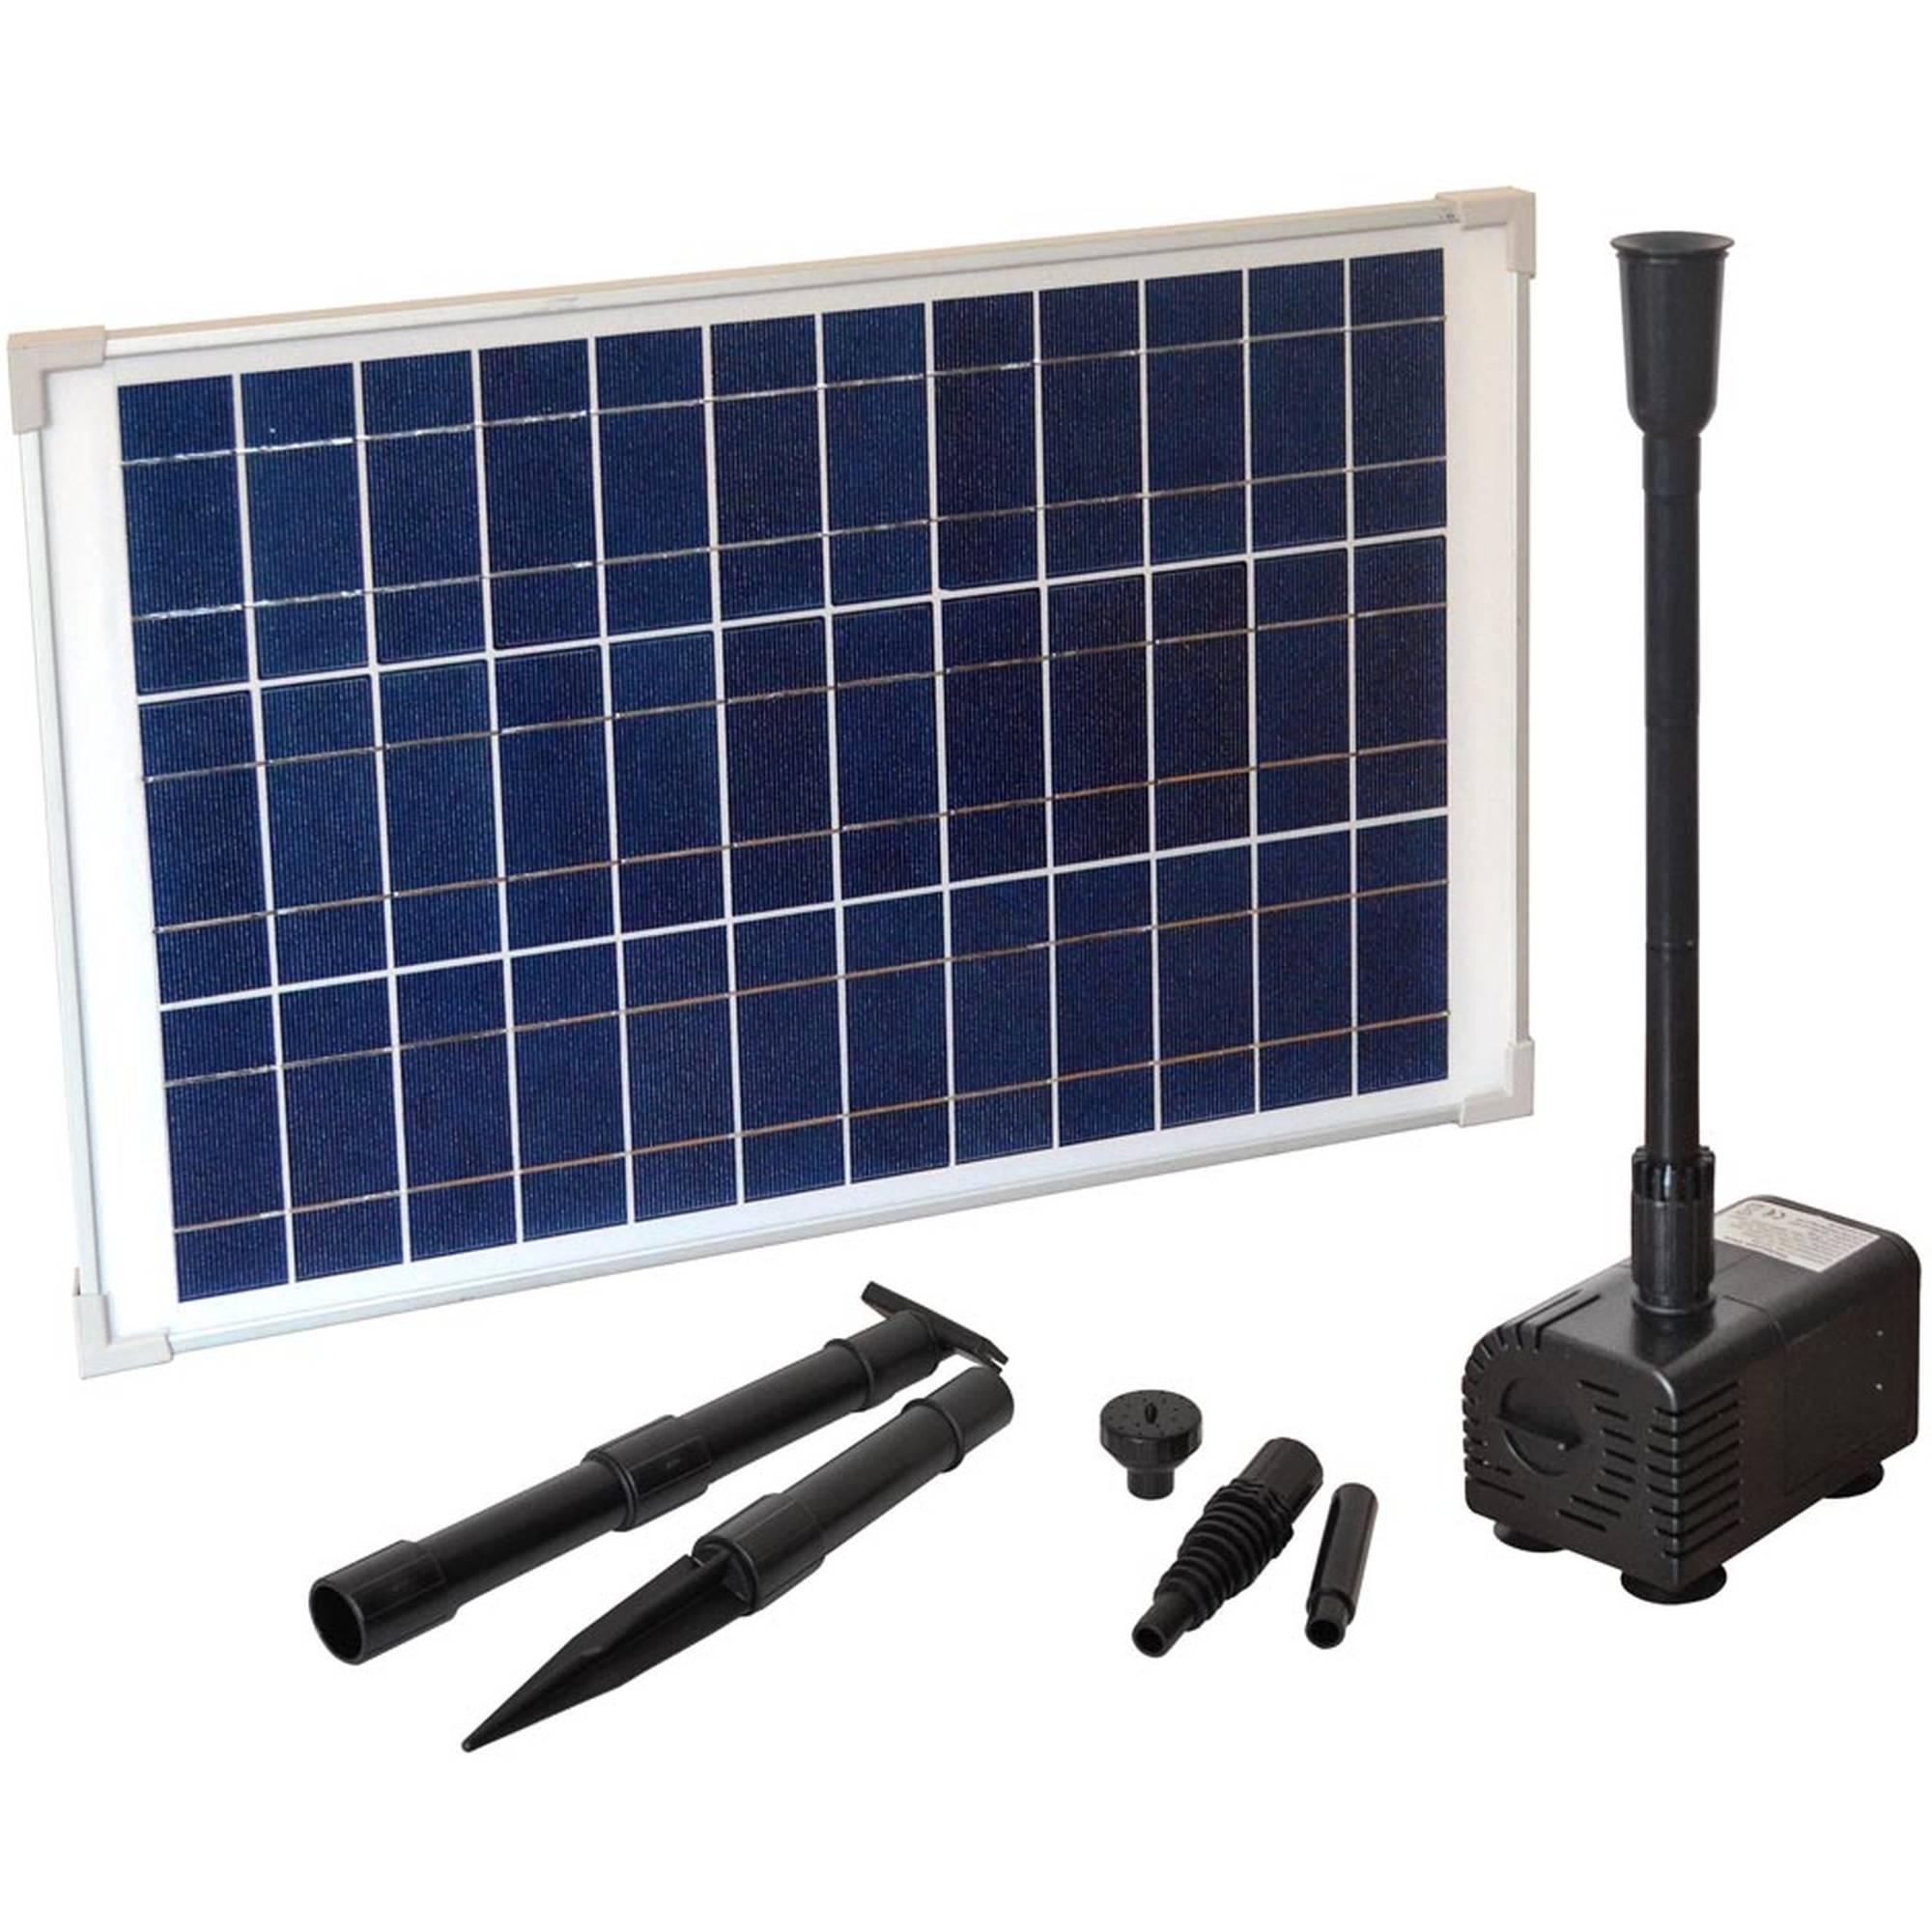 Solar-Teichpumpen-Set1000l/h